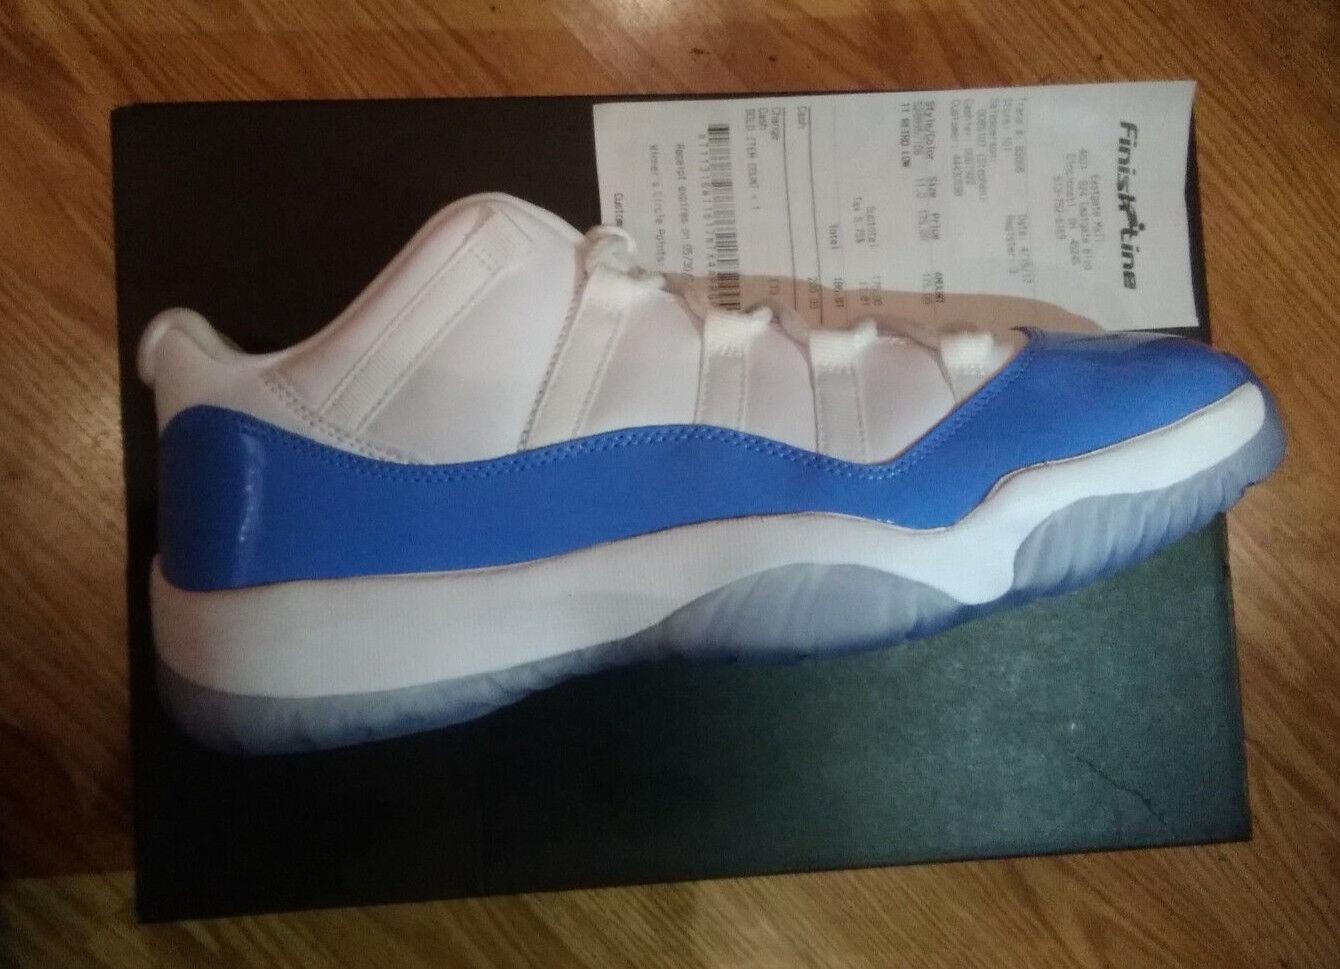 Nike Nike Nike Air Jordan Retro 11 low blanco / Universidad azul comodo baratos zapatos de mujer zapatos de mujer fcc76a